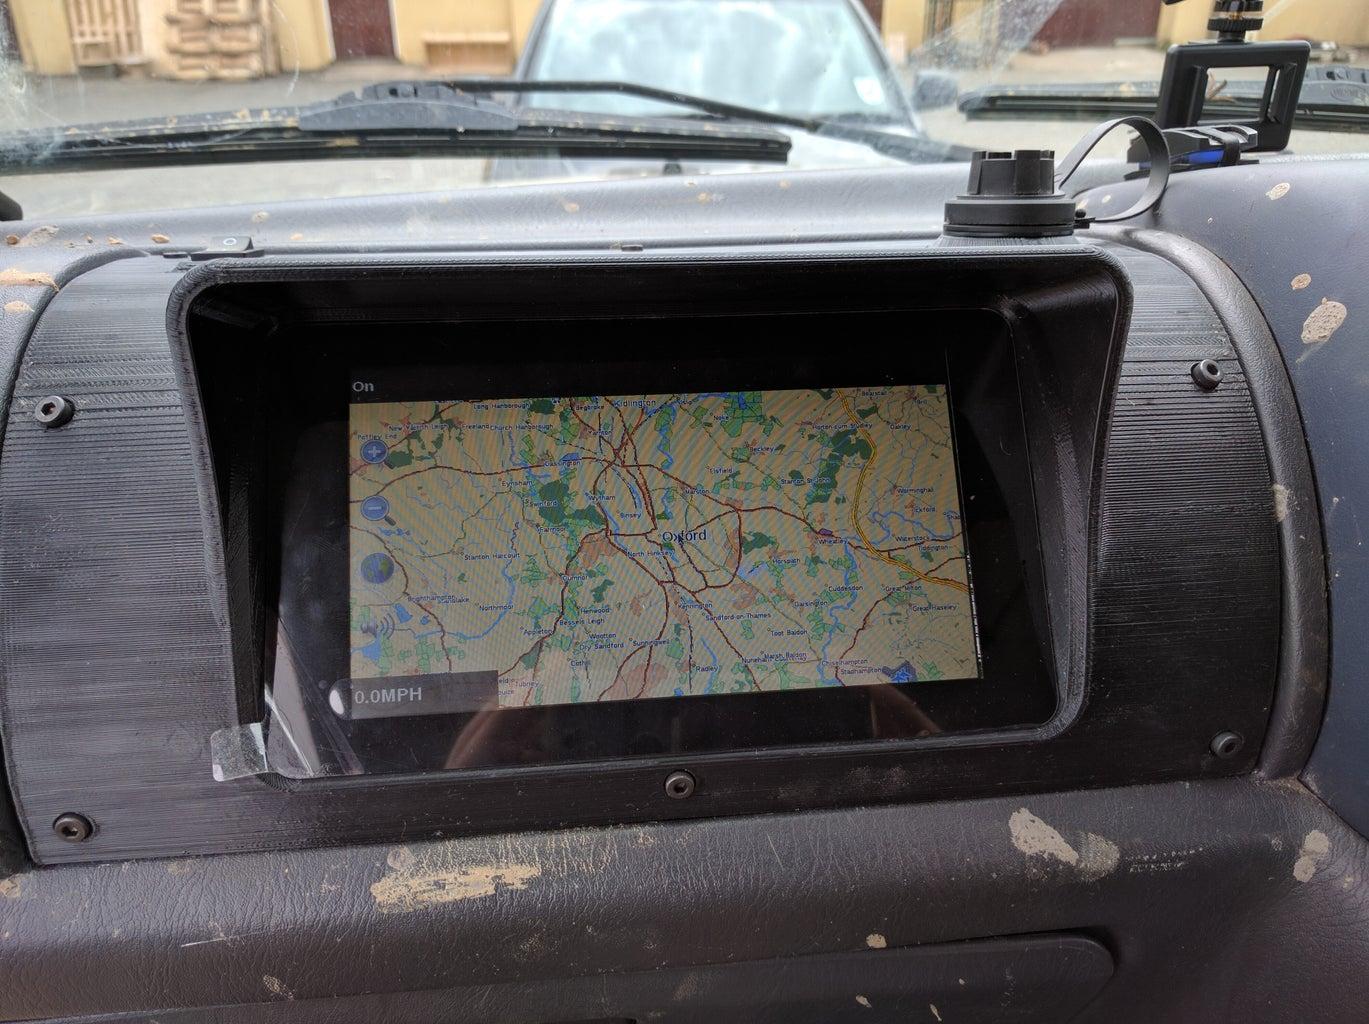 3D Printed In-Dash GPS Navigation - Raspberry Pi 3.